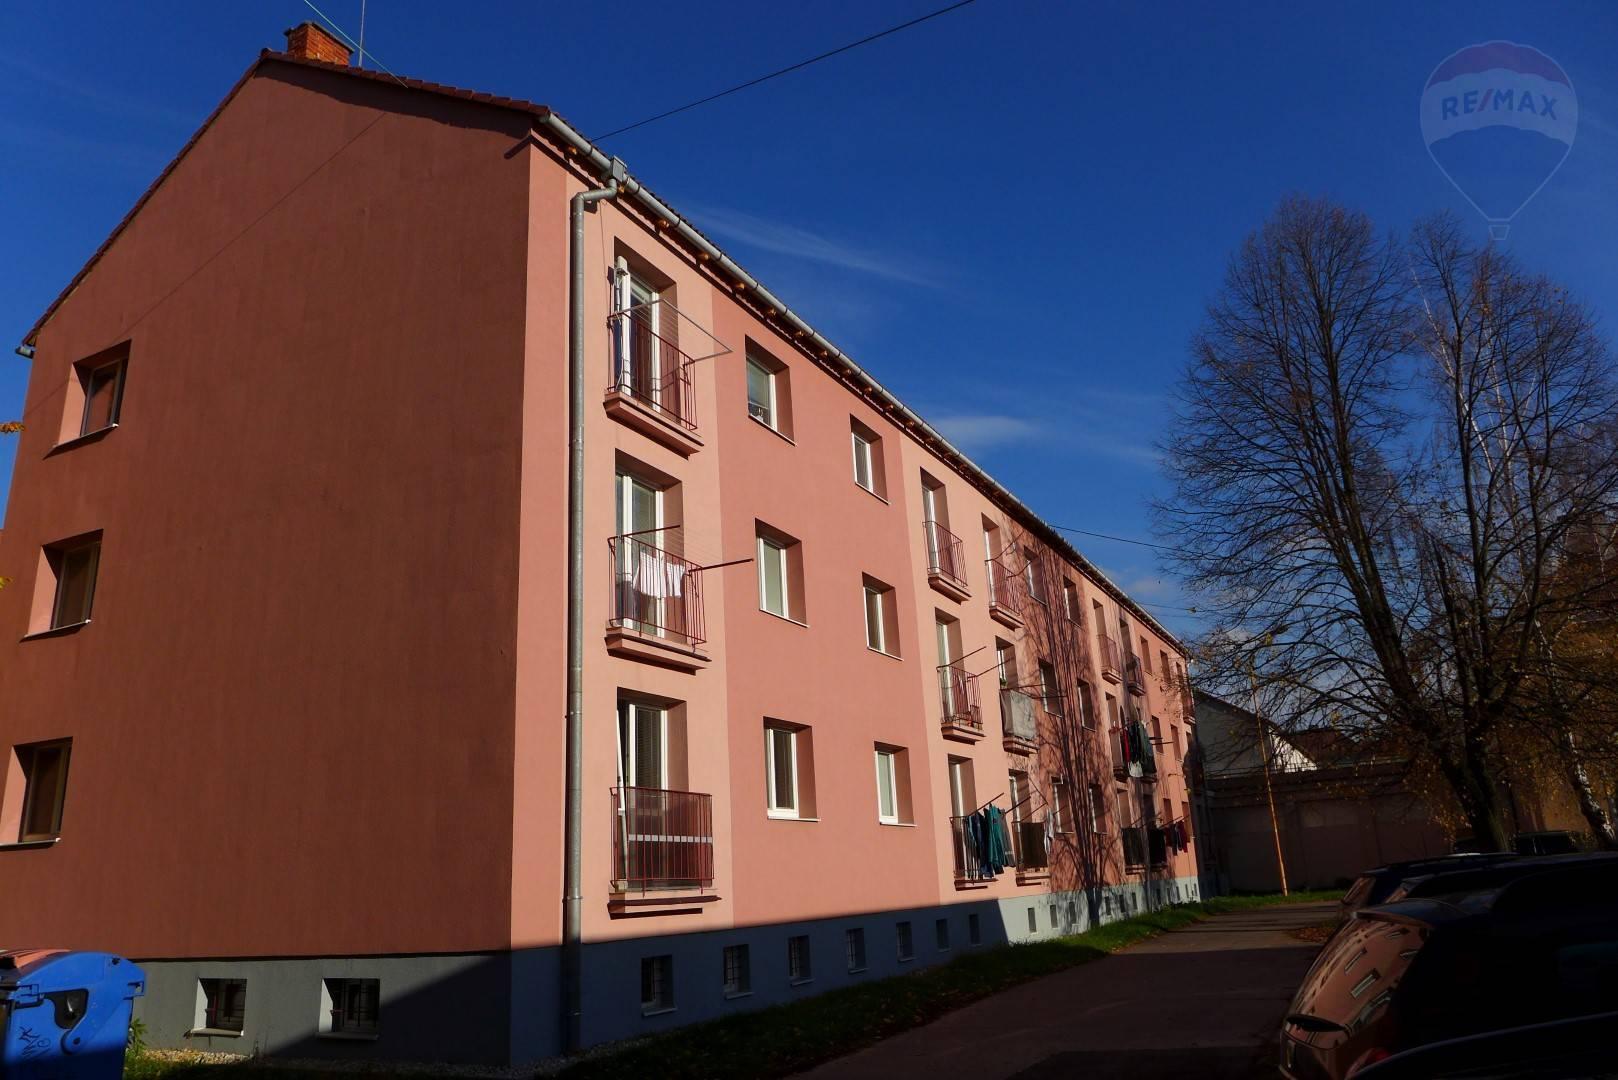 2 izbový byt, 51 m2, ul. F. Madvu - Staré sídlisko PRIEVIDZA